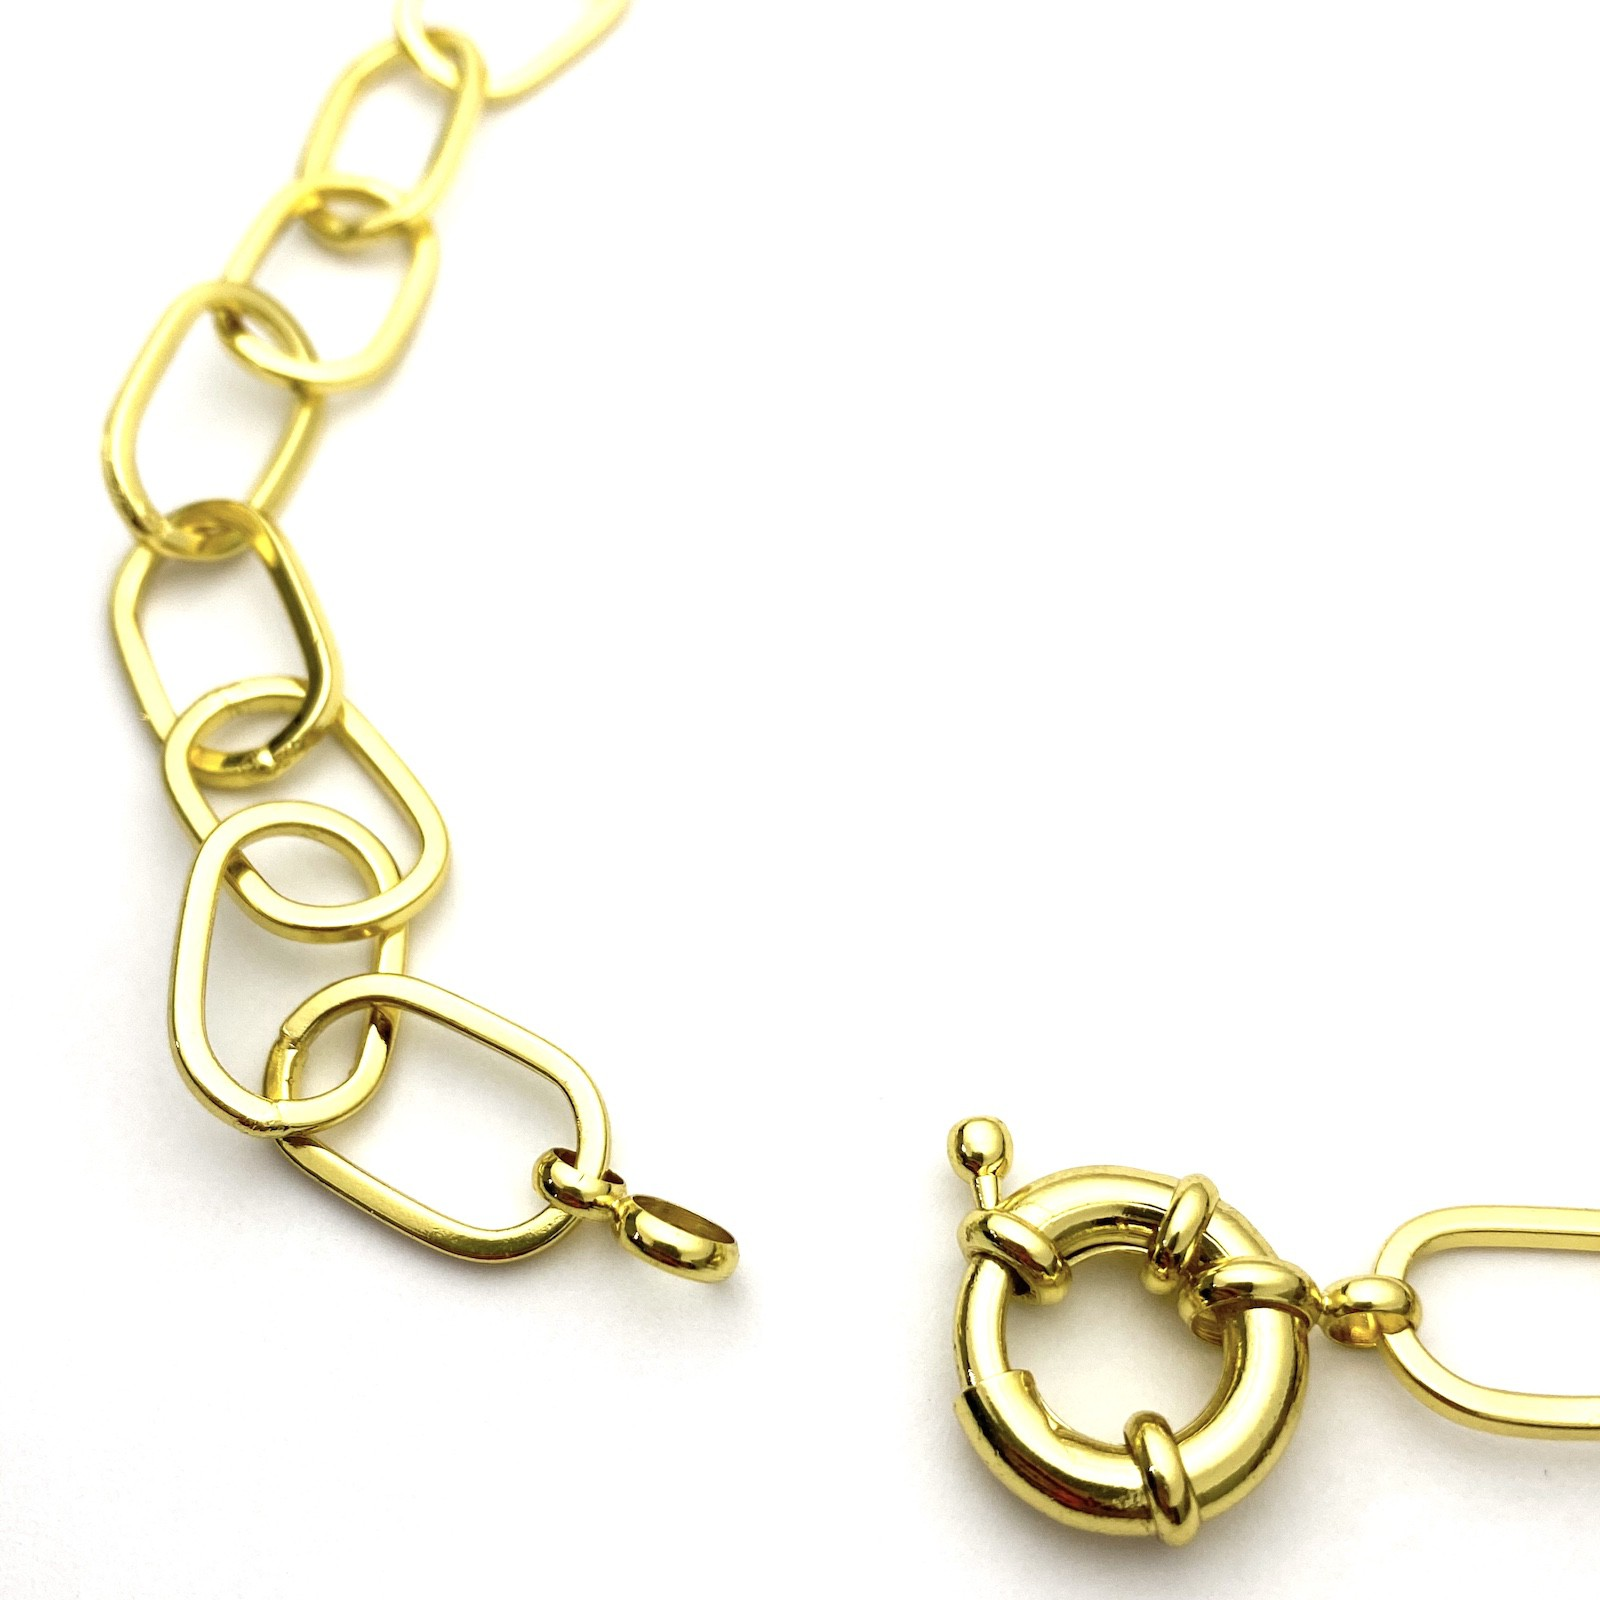 Corrente Chain Elos Fecho Boia 40cm 20g (Banho Ouro 24k)